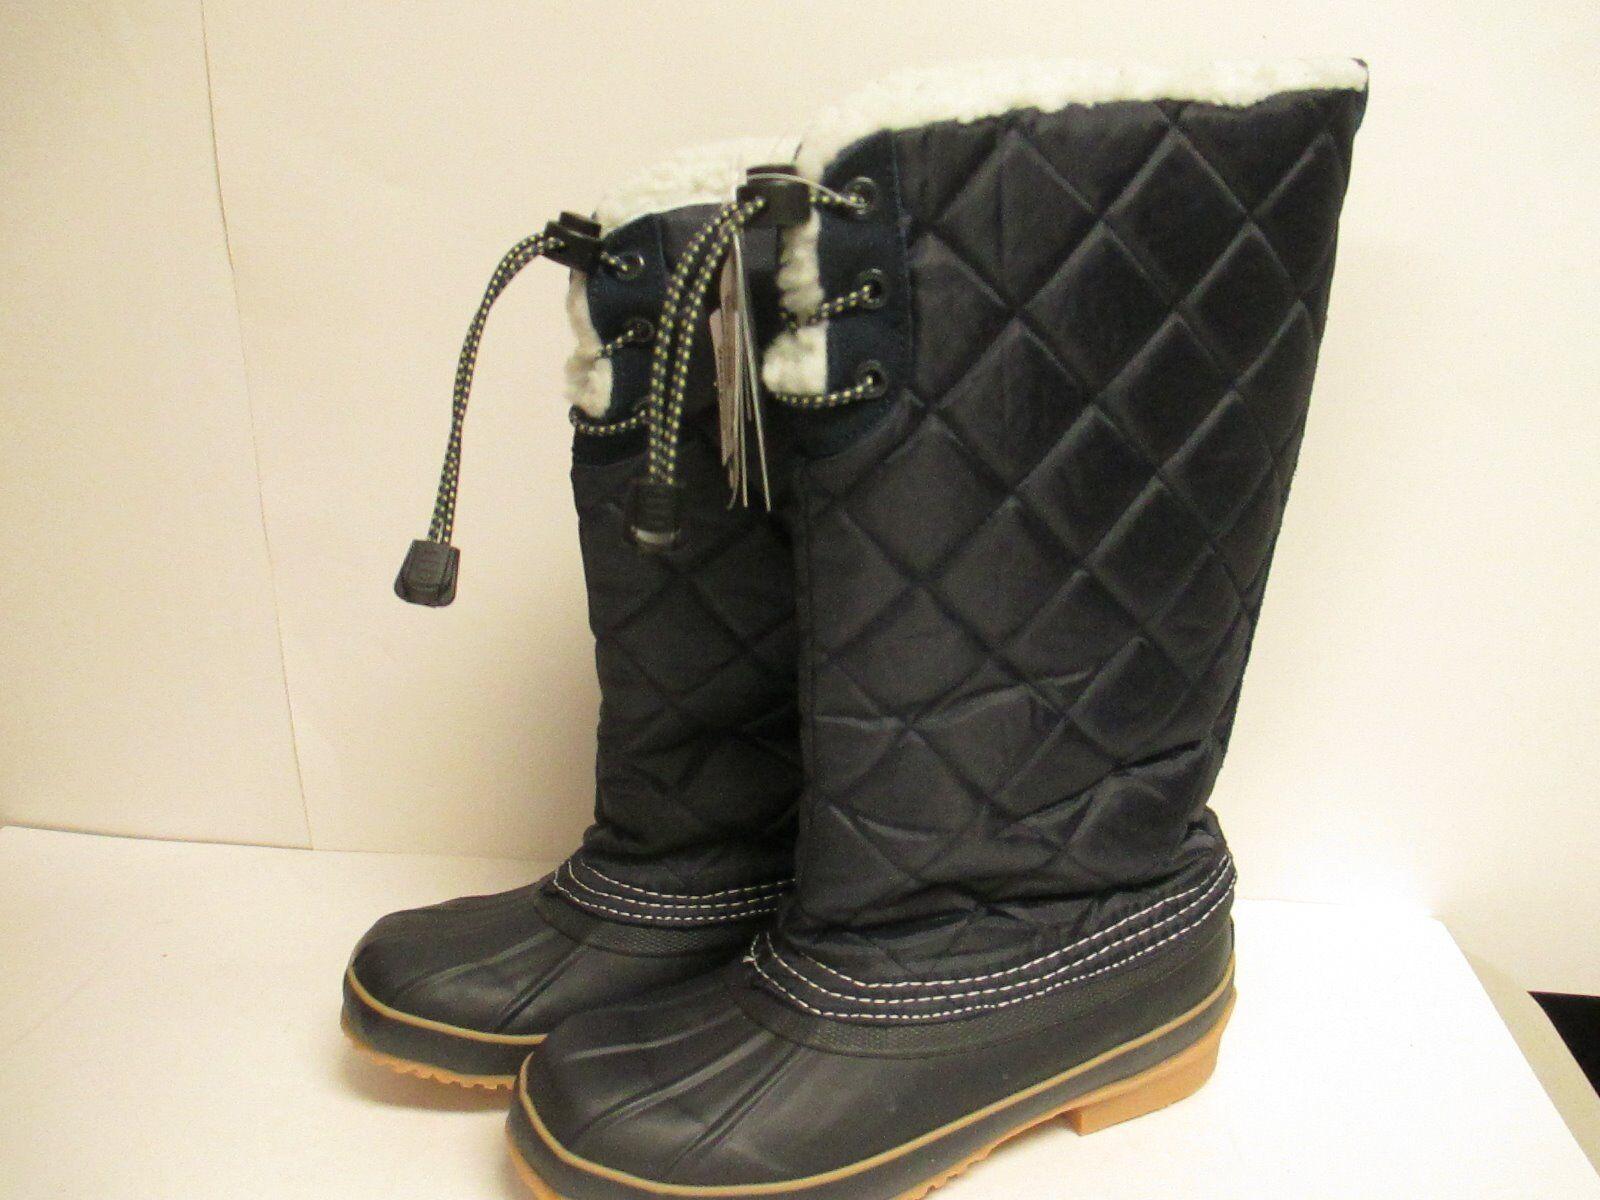 Khombu Womens Prep Bean Winter Boots Navy New with Box